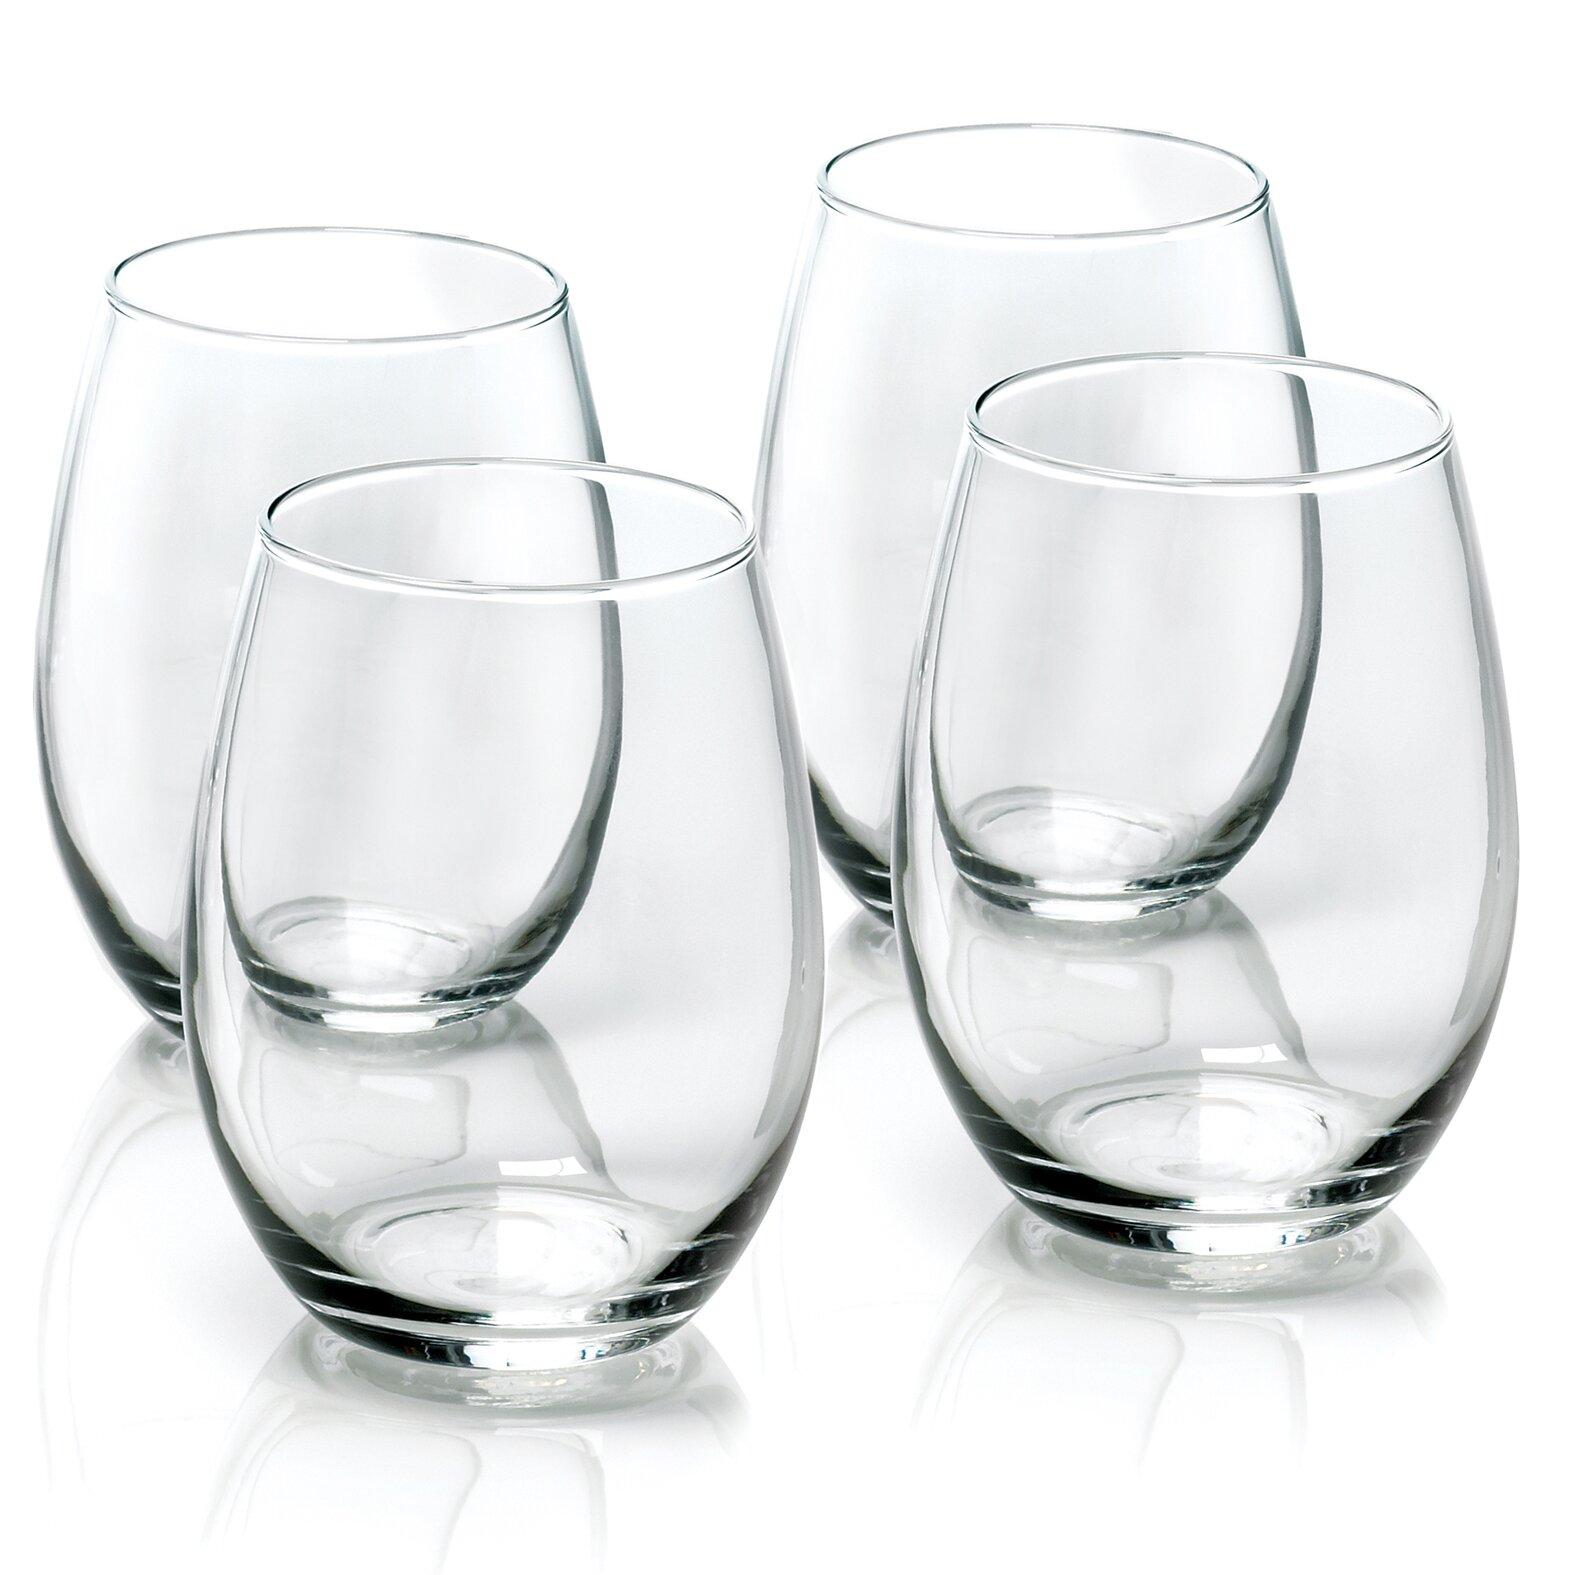 Anchor Hocking Stemless Wine Glasses Reviews Wayfair